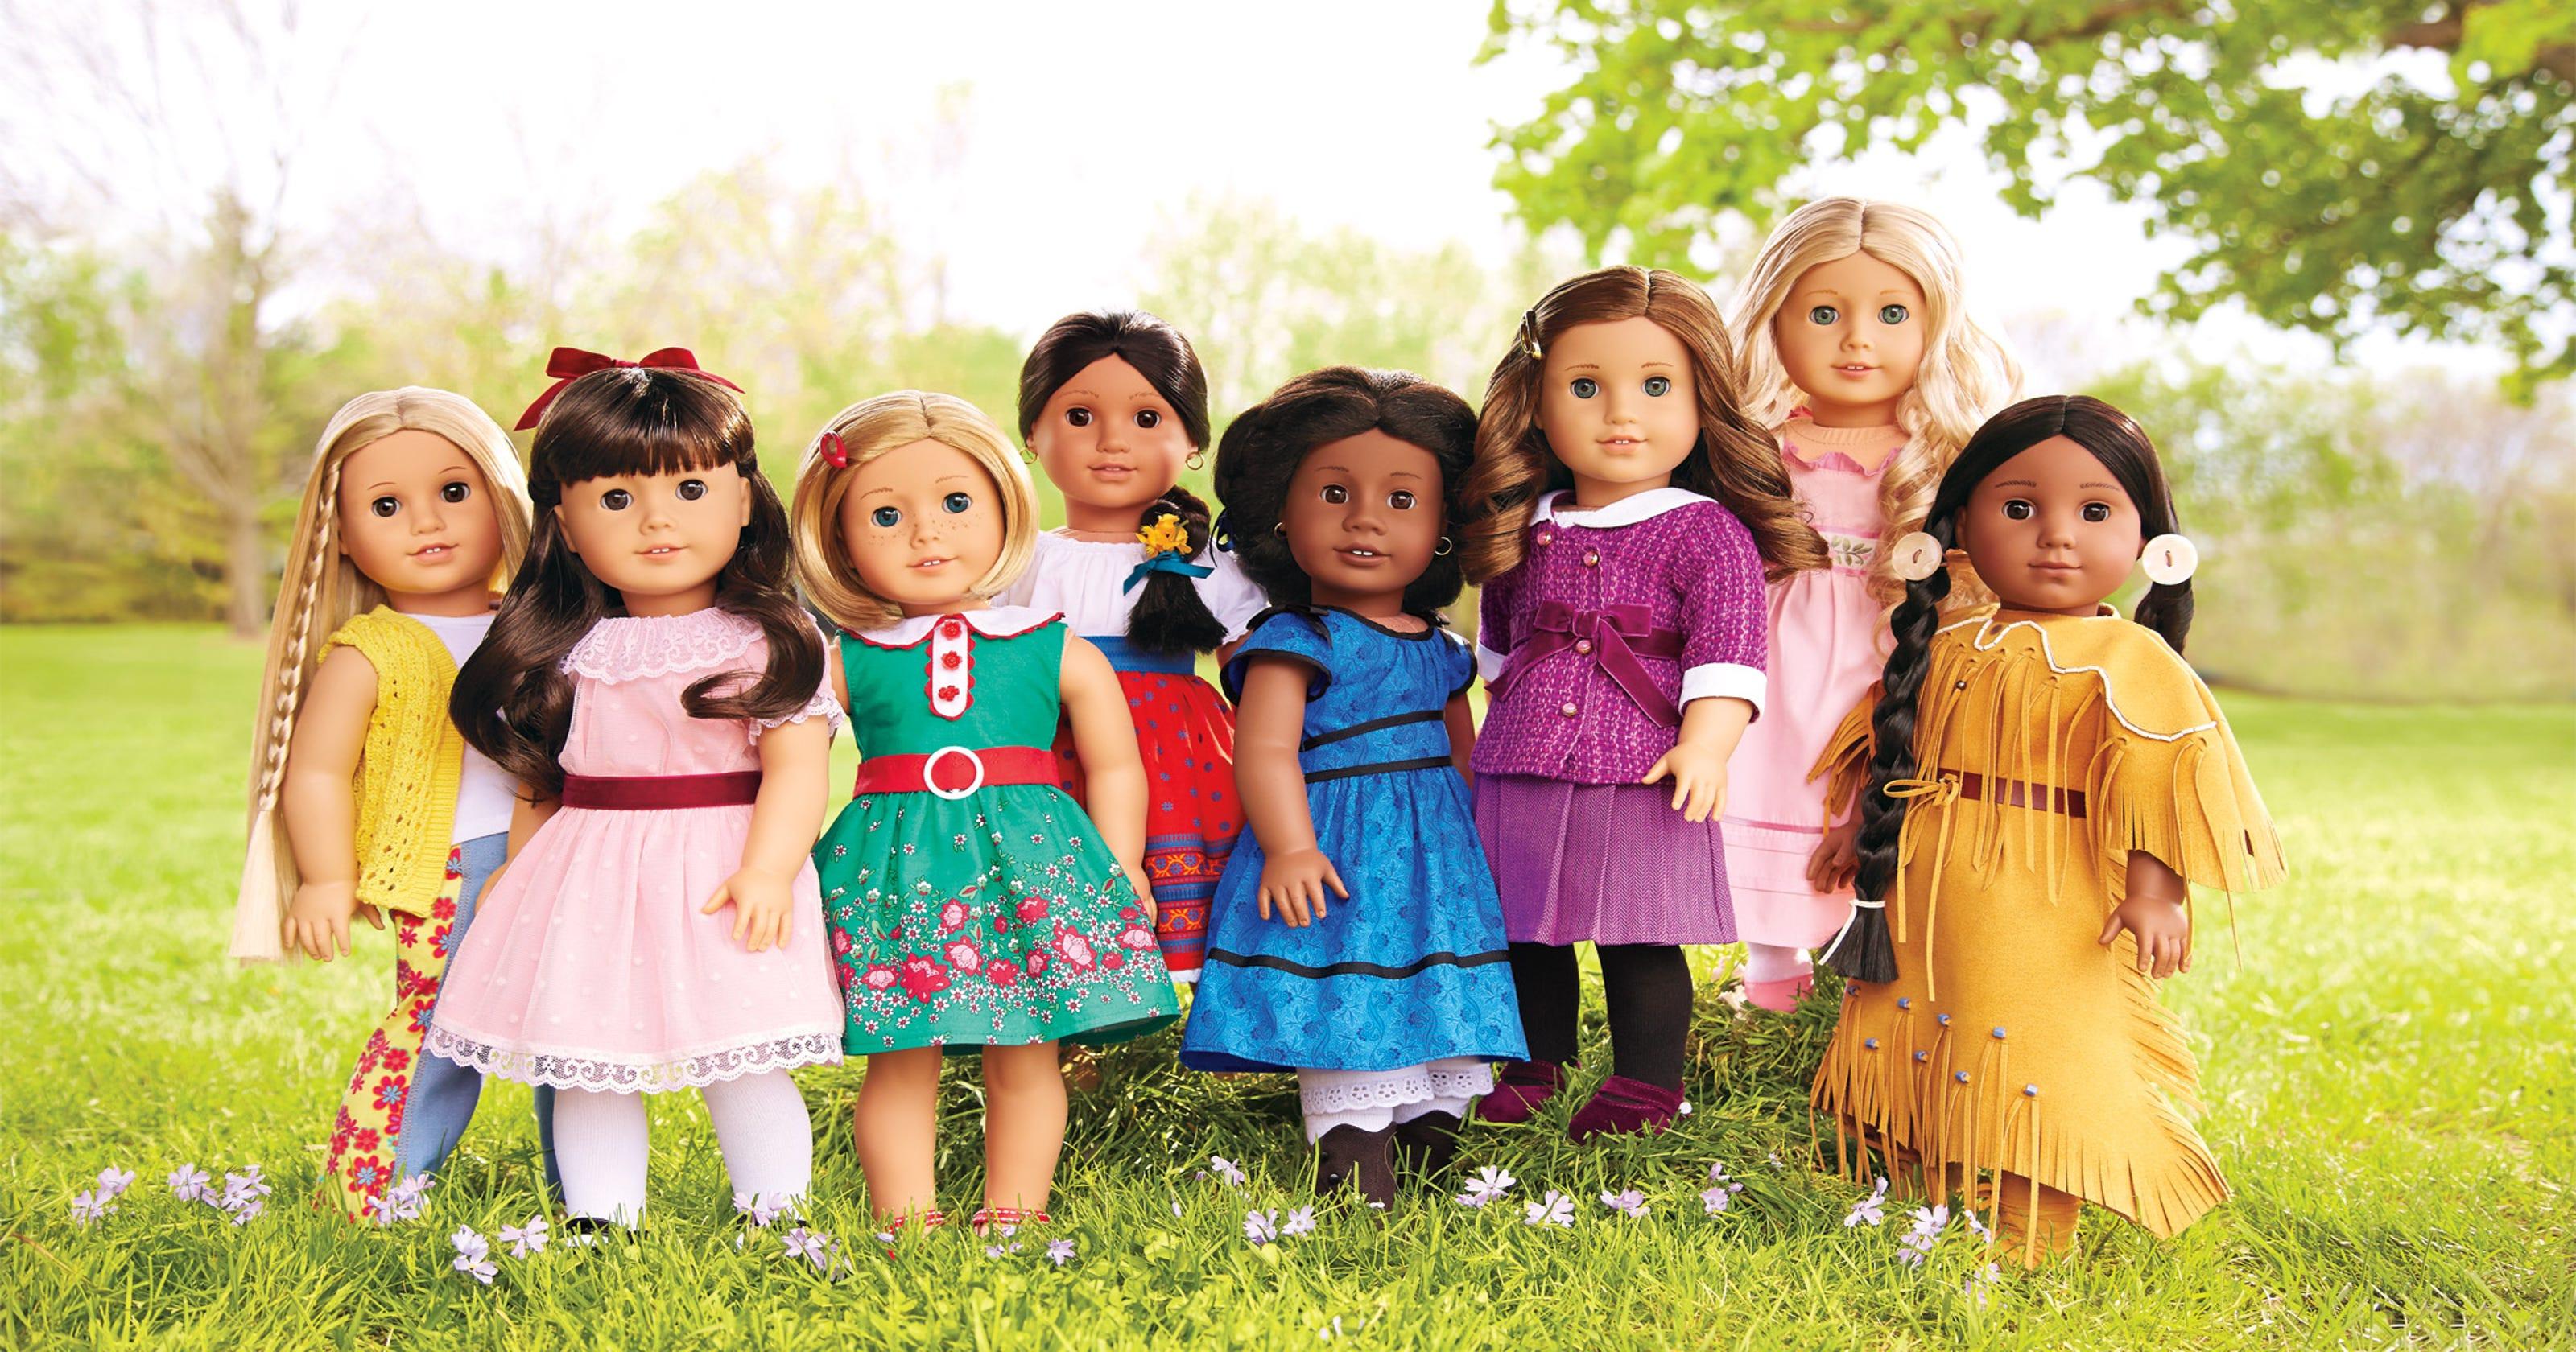 a1c1f8c679c7 American Girl dolls let kids be kids